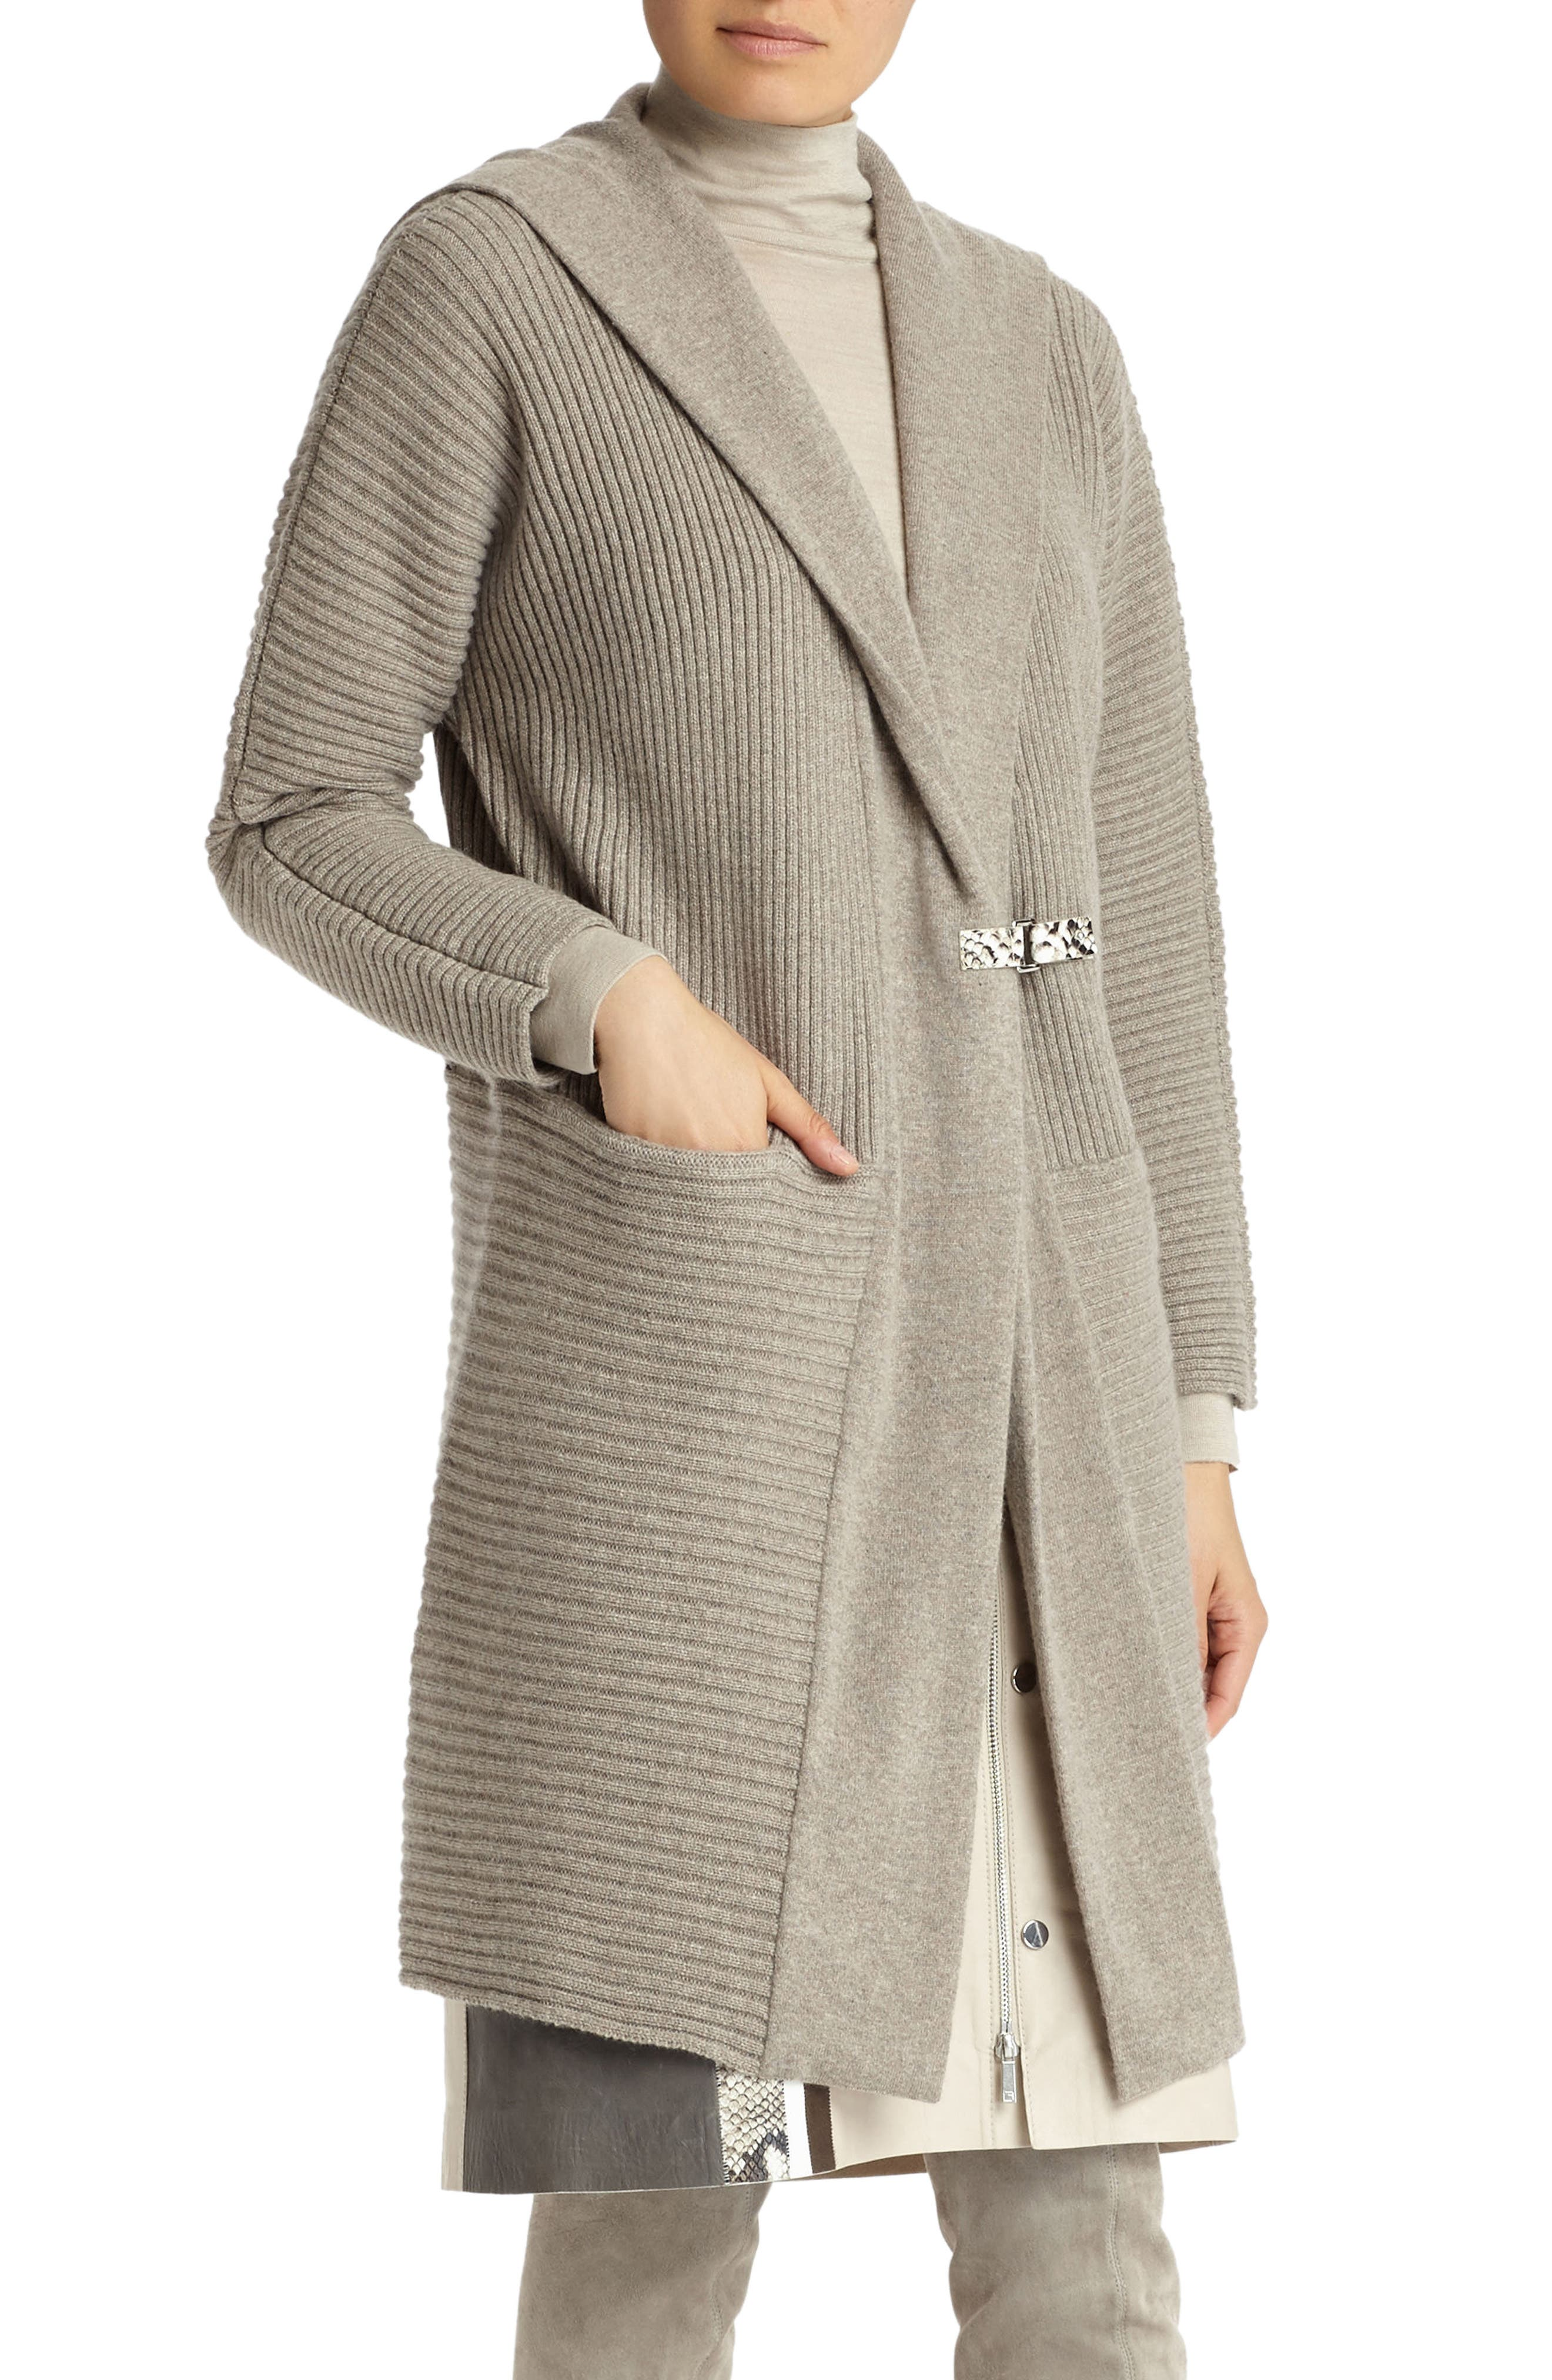 Mixed Rib Cashmere Hooded Cardigan,                         Main,                         color, Portobello Melange